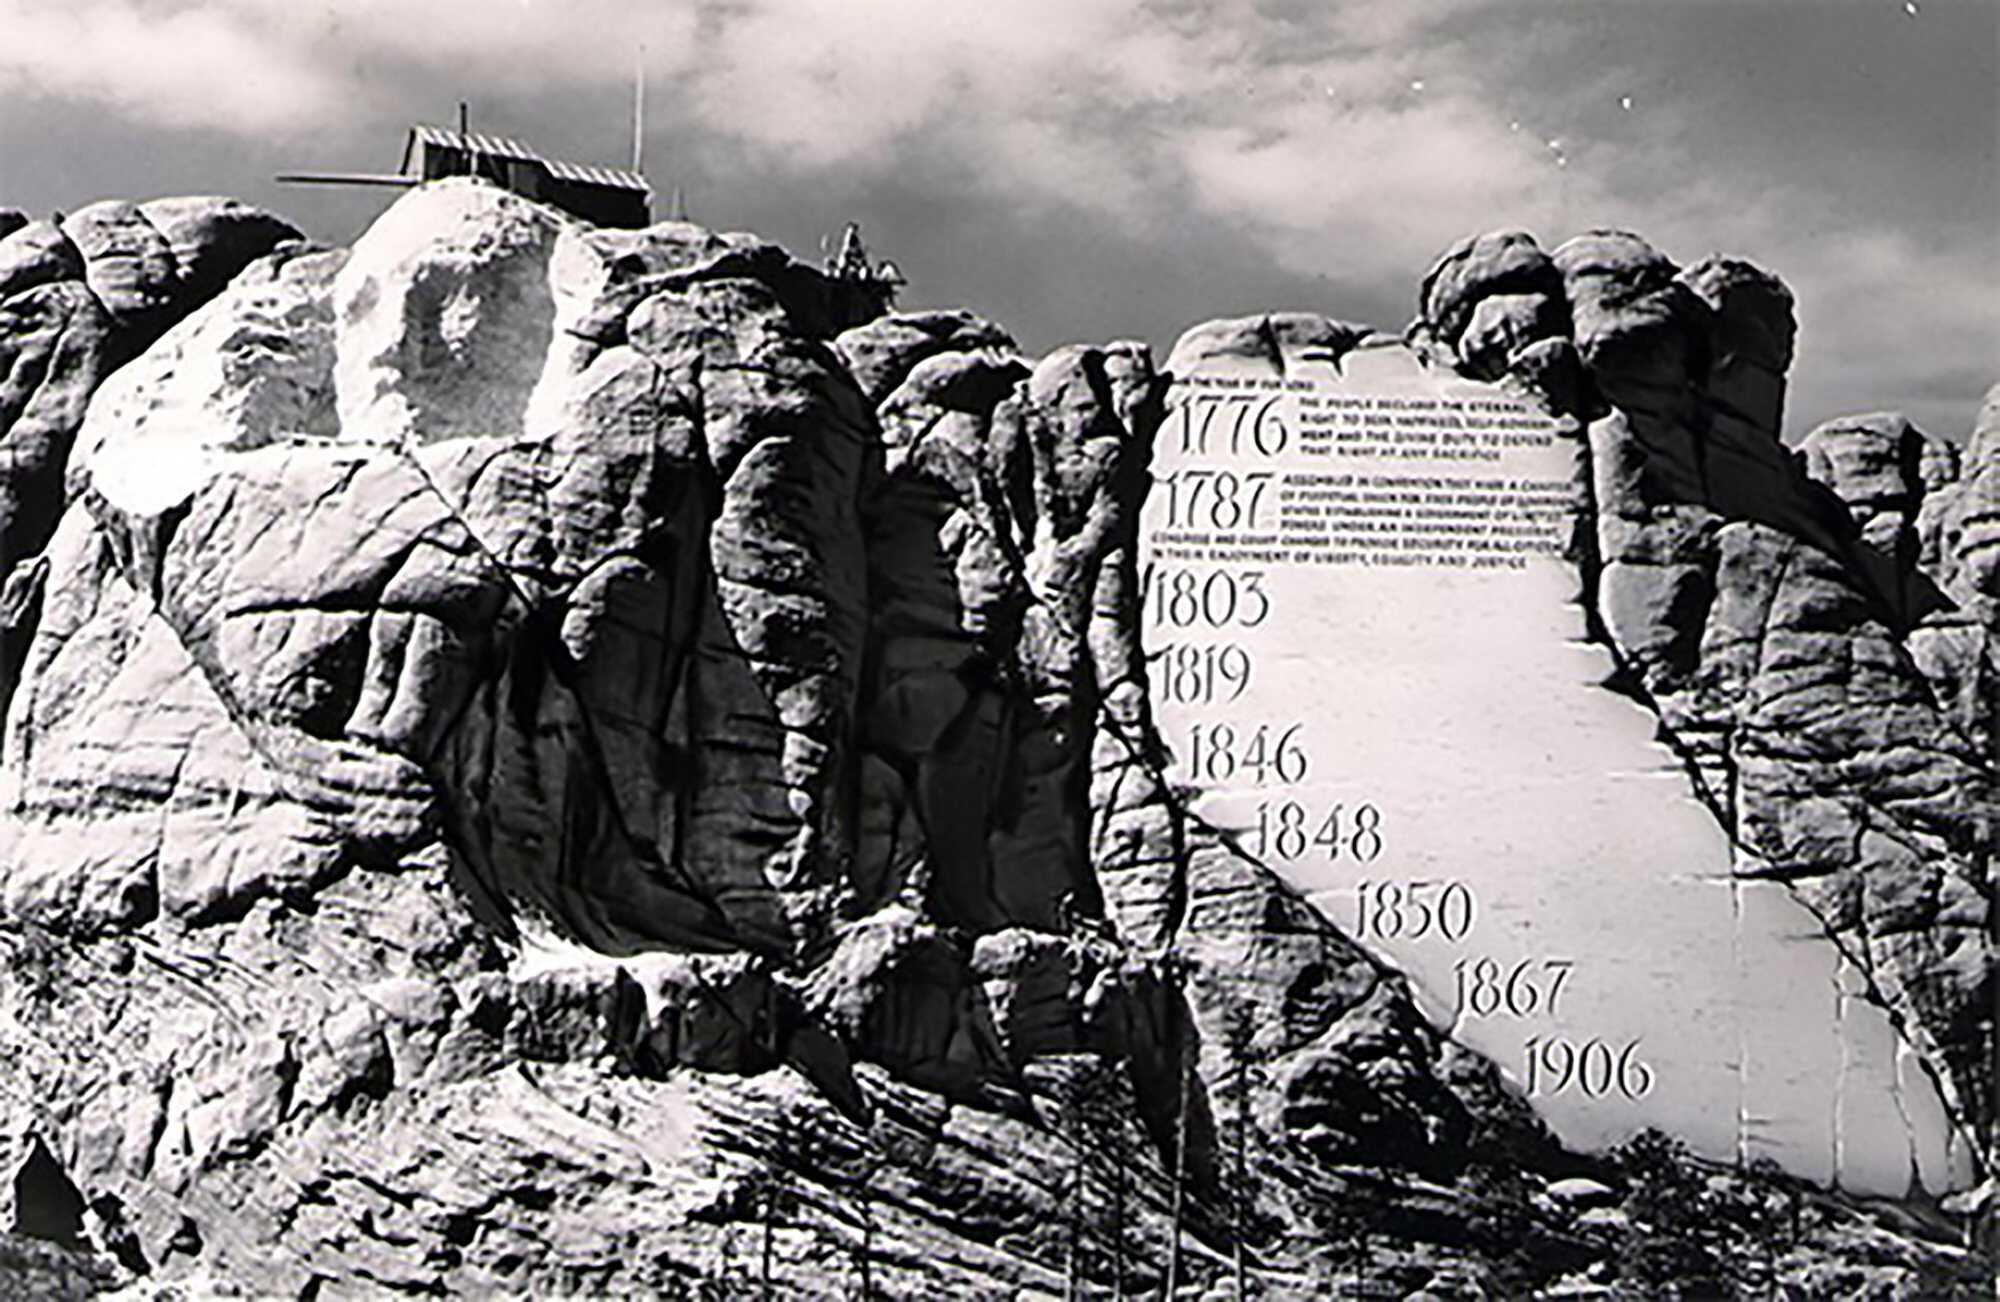 Rushmore-inscribtion-NPS.jpg